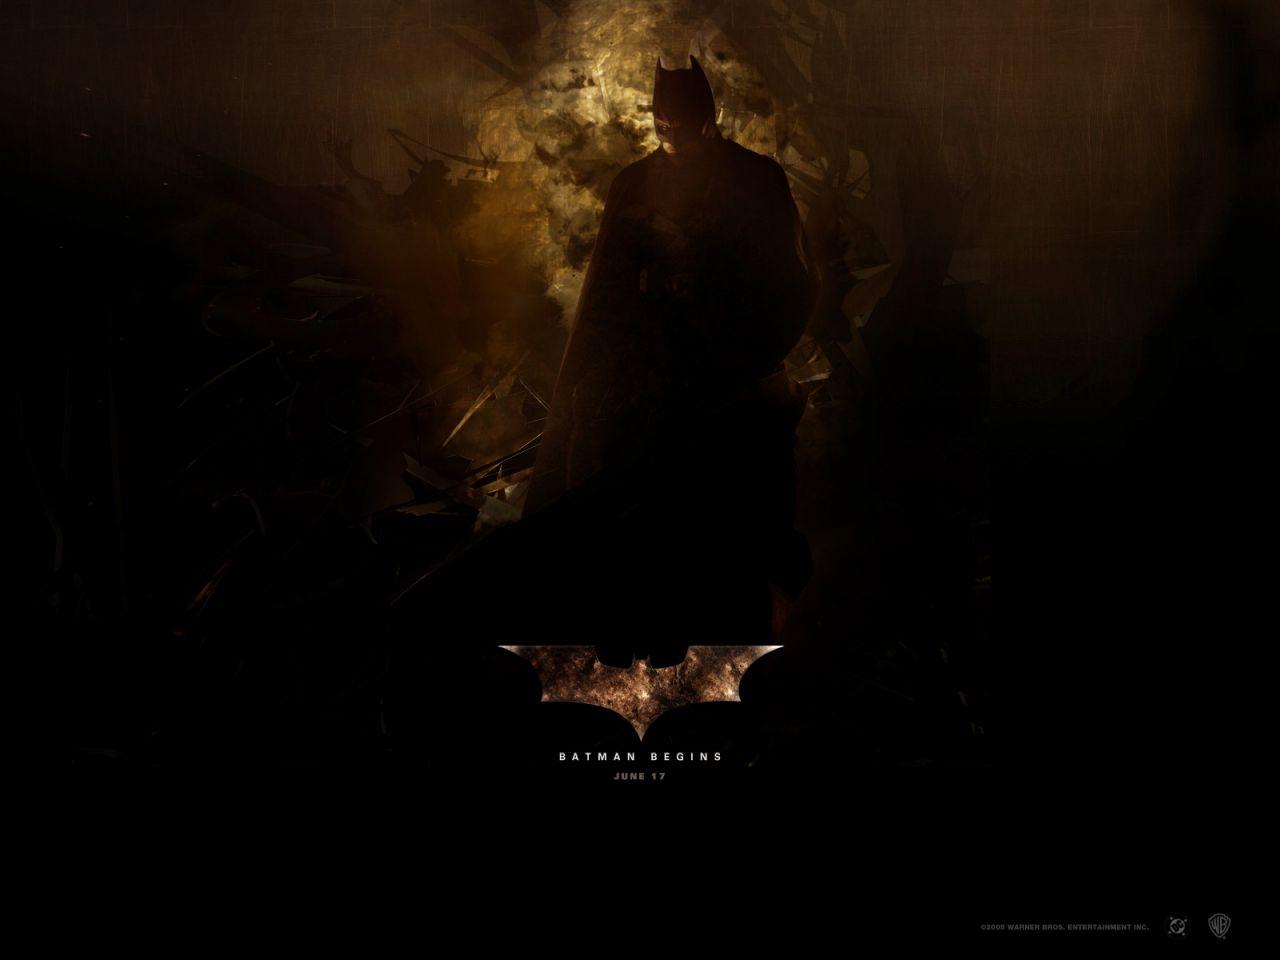 Batman Begins June 17 Poster Wallpaper 1280x960